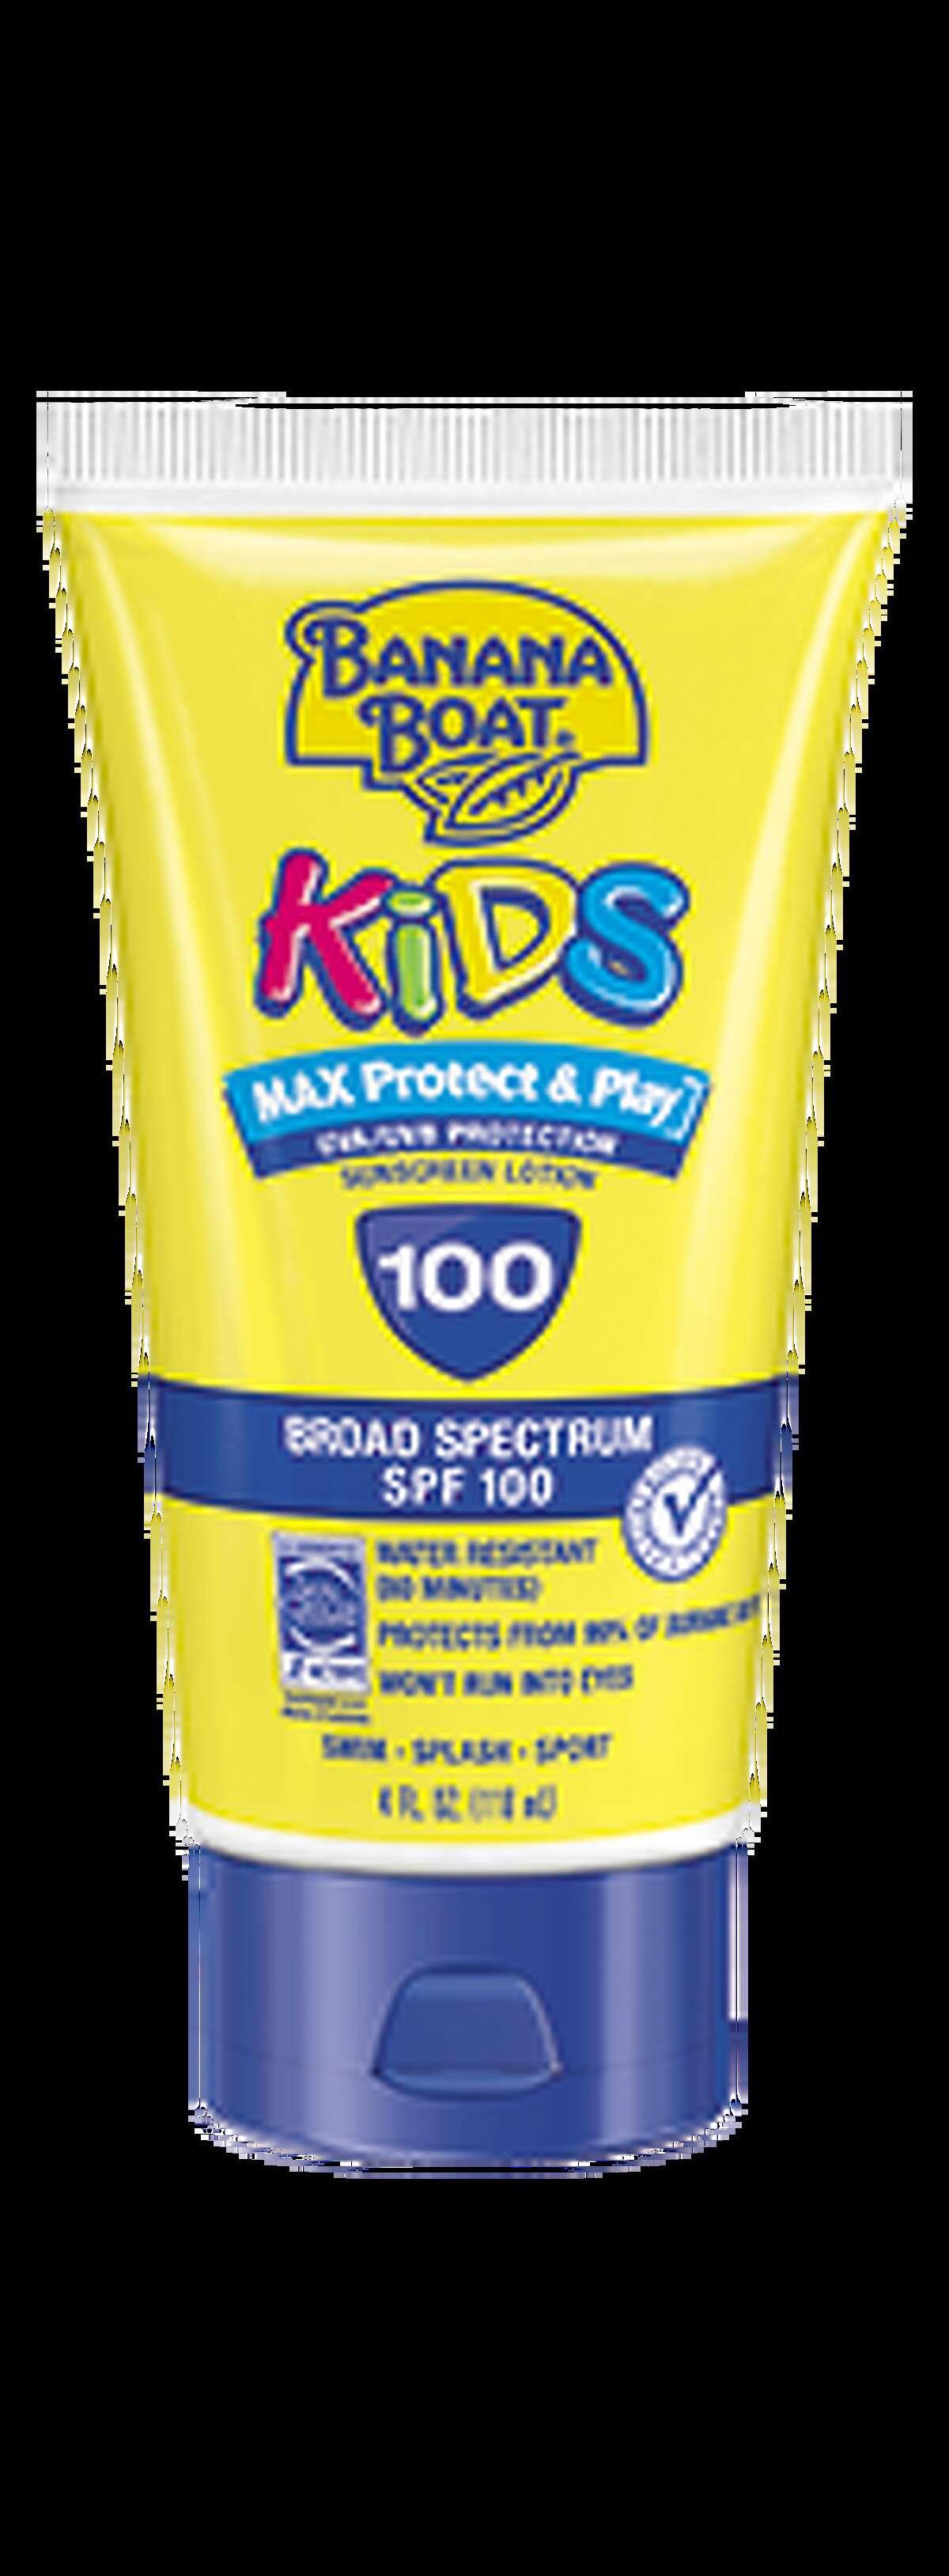 Banana Boat Kids Sunscreen Lotion, SPF 100Source: Banana Boat